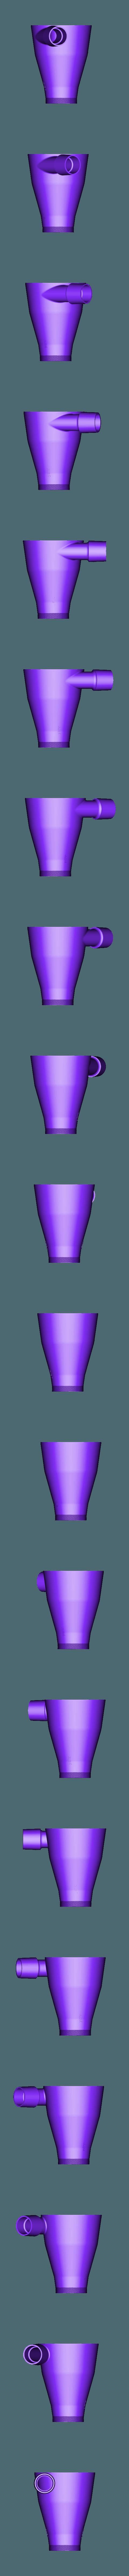 20cm.stl Download STL file 48 Head Multi Cyclone Chamber (Compact Size Added) • 3D printer model, kanadali